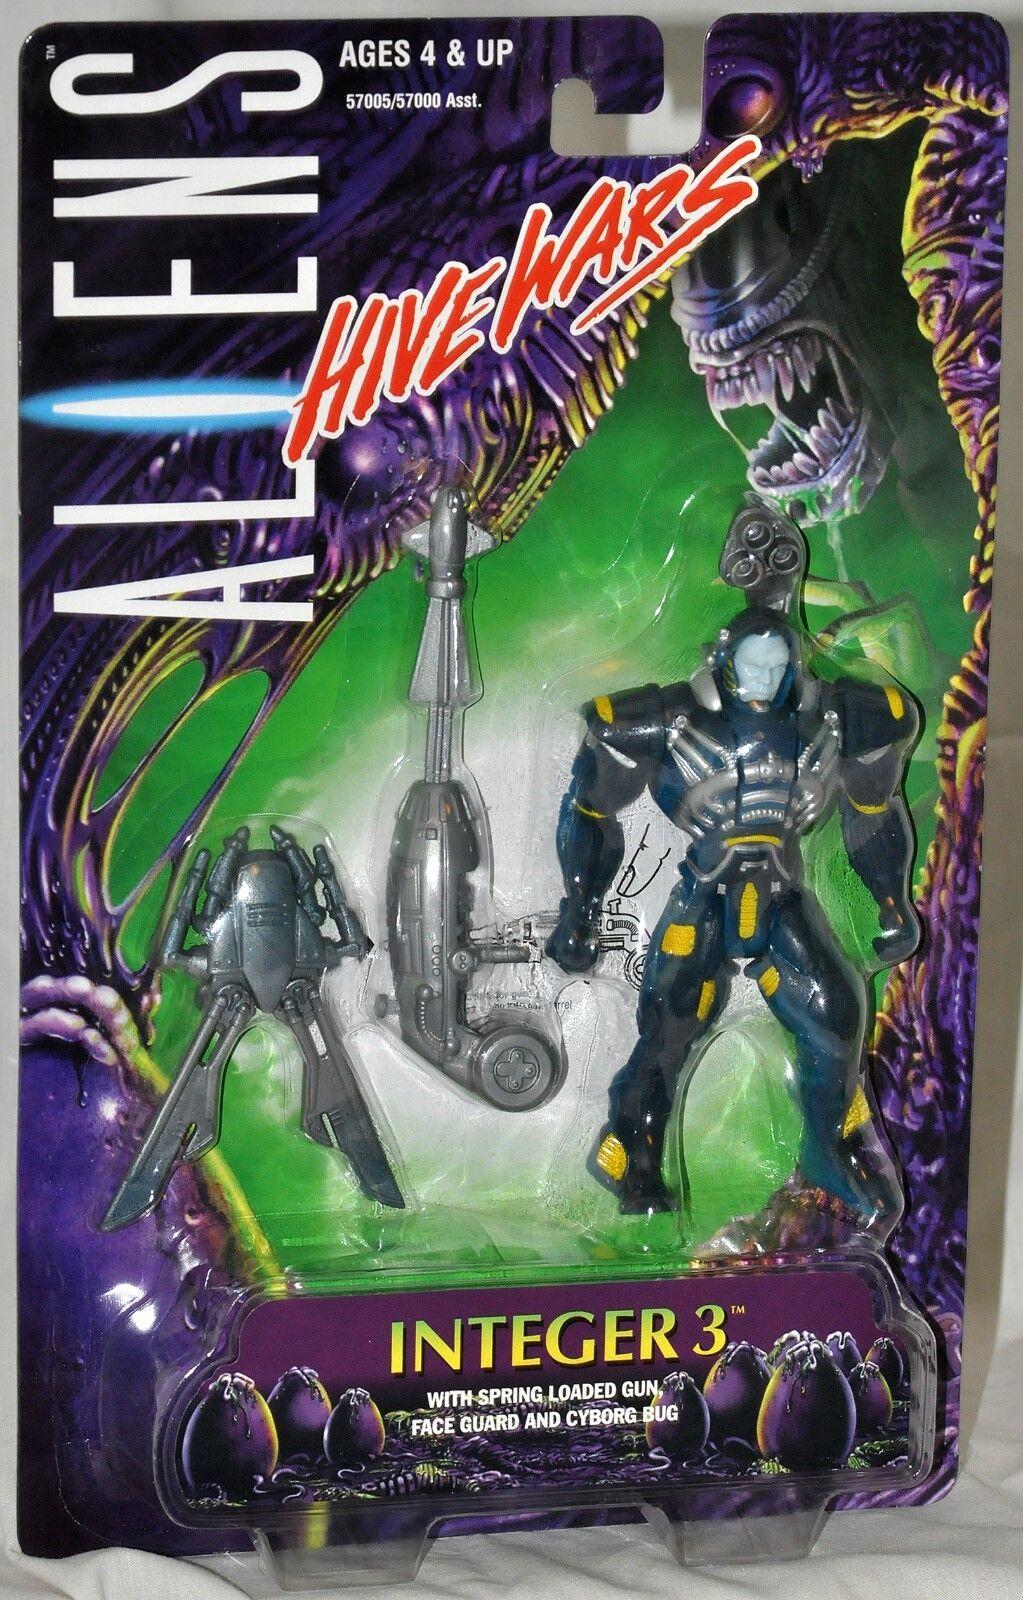 ALIENS Hive Wars Integer 3 figure figure figure with Spring Loaded Gun MOC 57005 Kenner 1998 d4ce3f